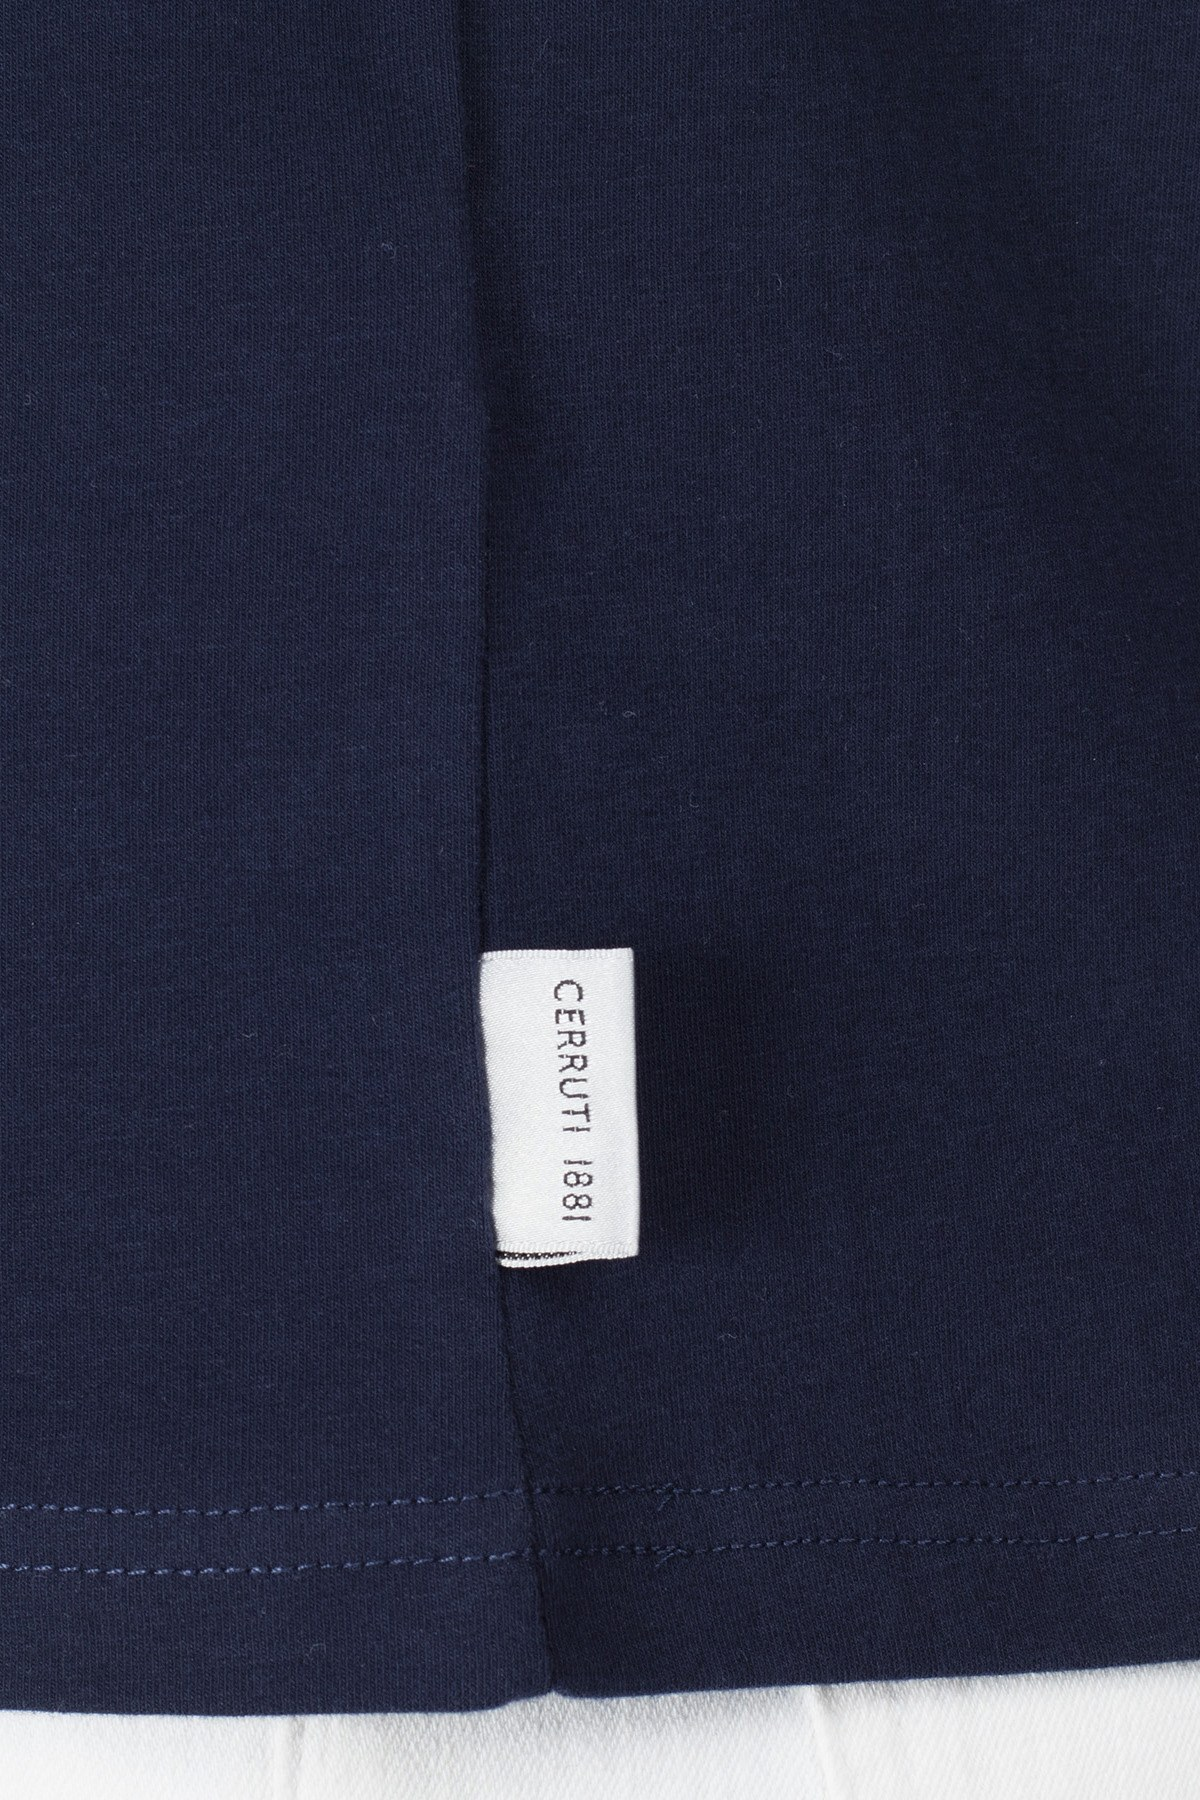 Cerruti 1881 Erkek T Shirt 203-001726 LACİVERT